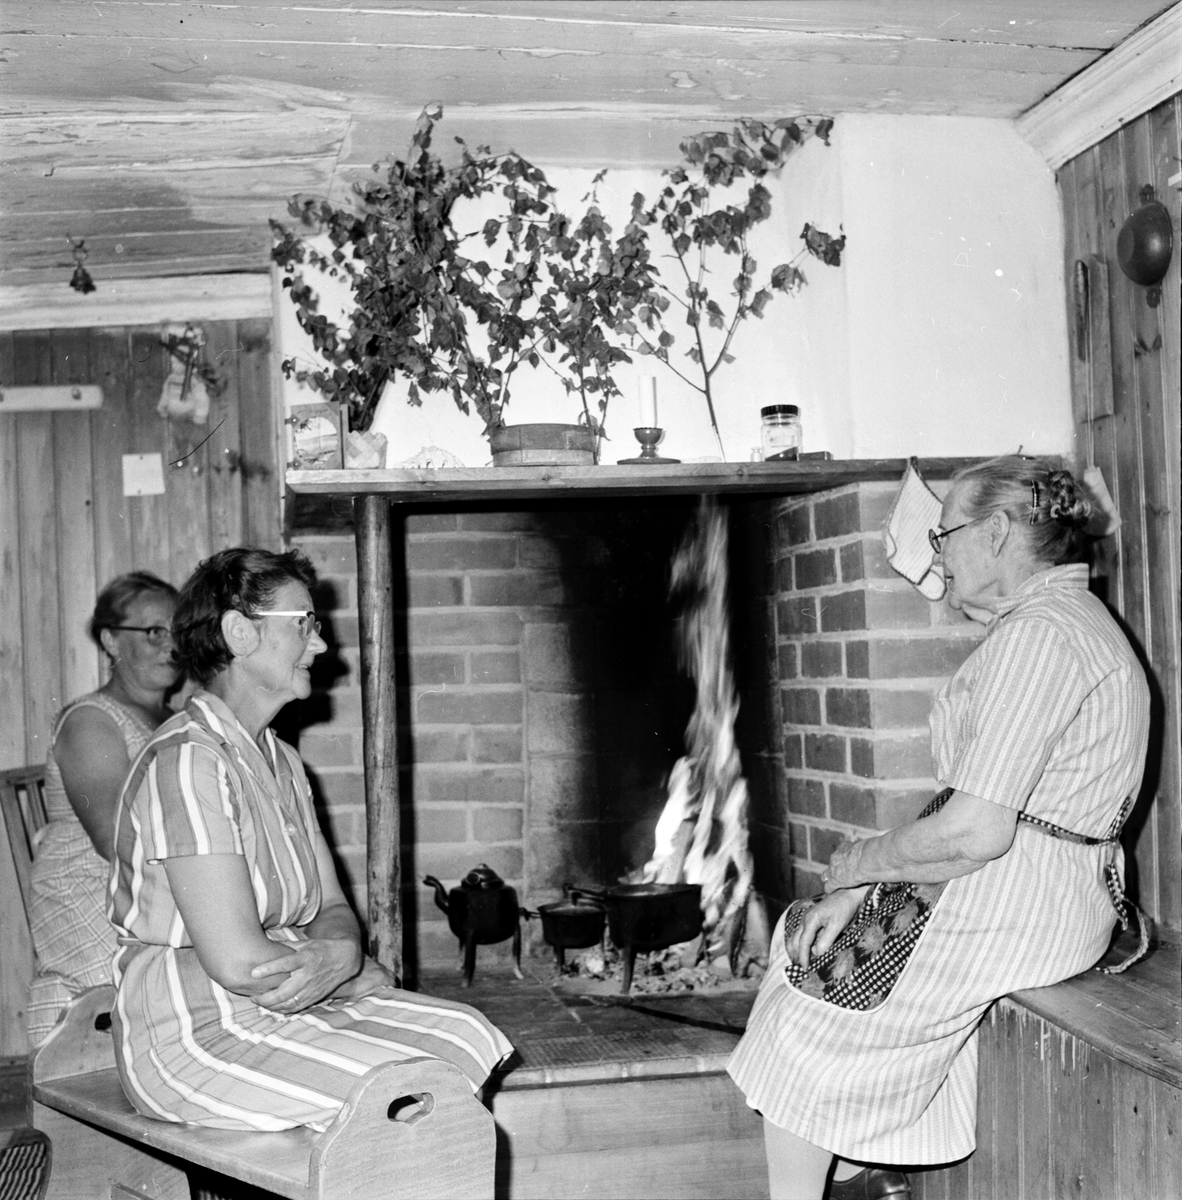 Möckelåsen, Arbrå, Hos 92-åriga Bopigan Margareta Kallin, 2 Aug 1966